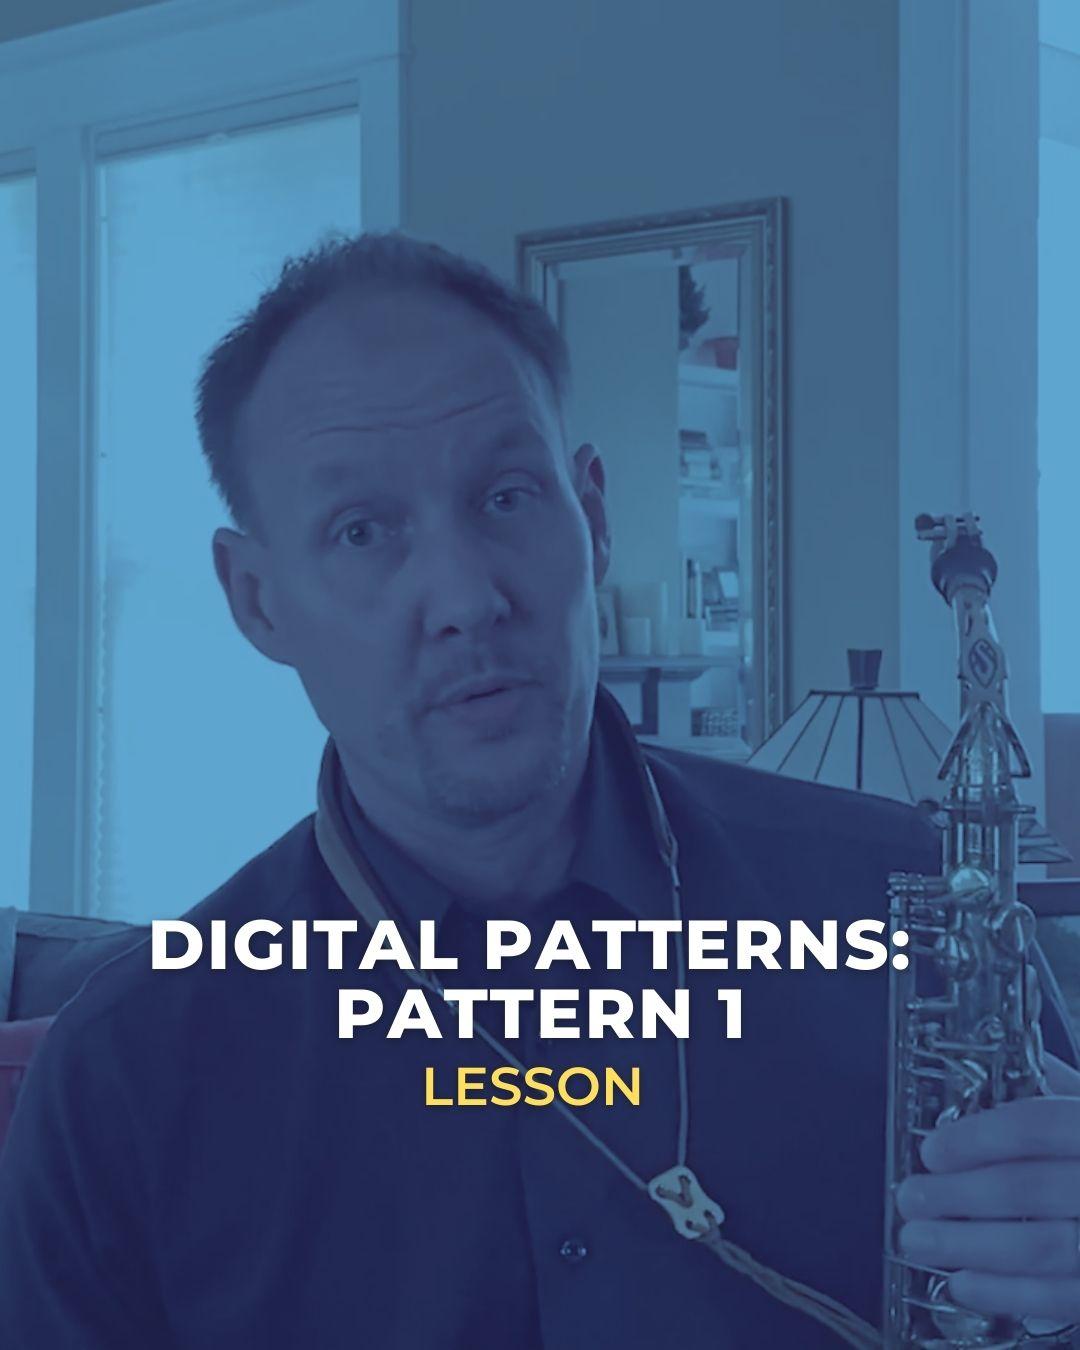 Digital Pattern 1